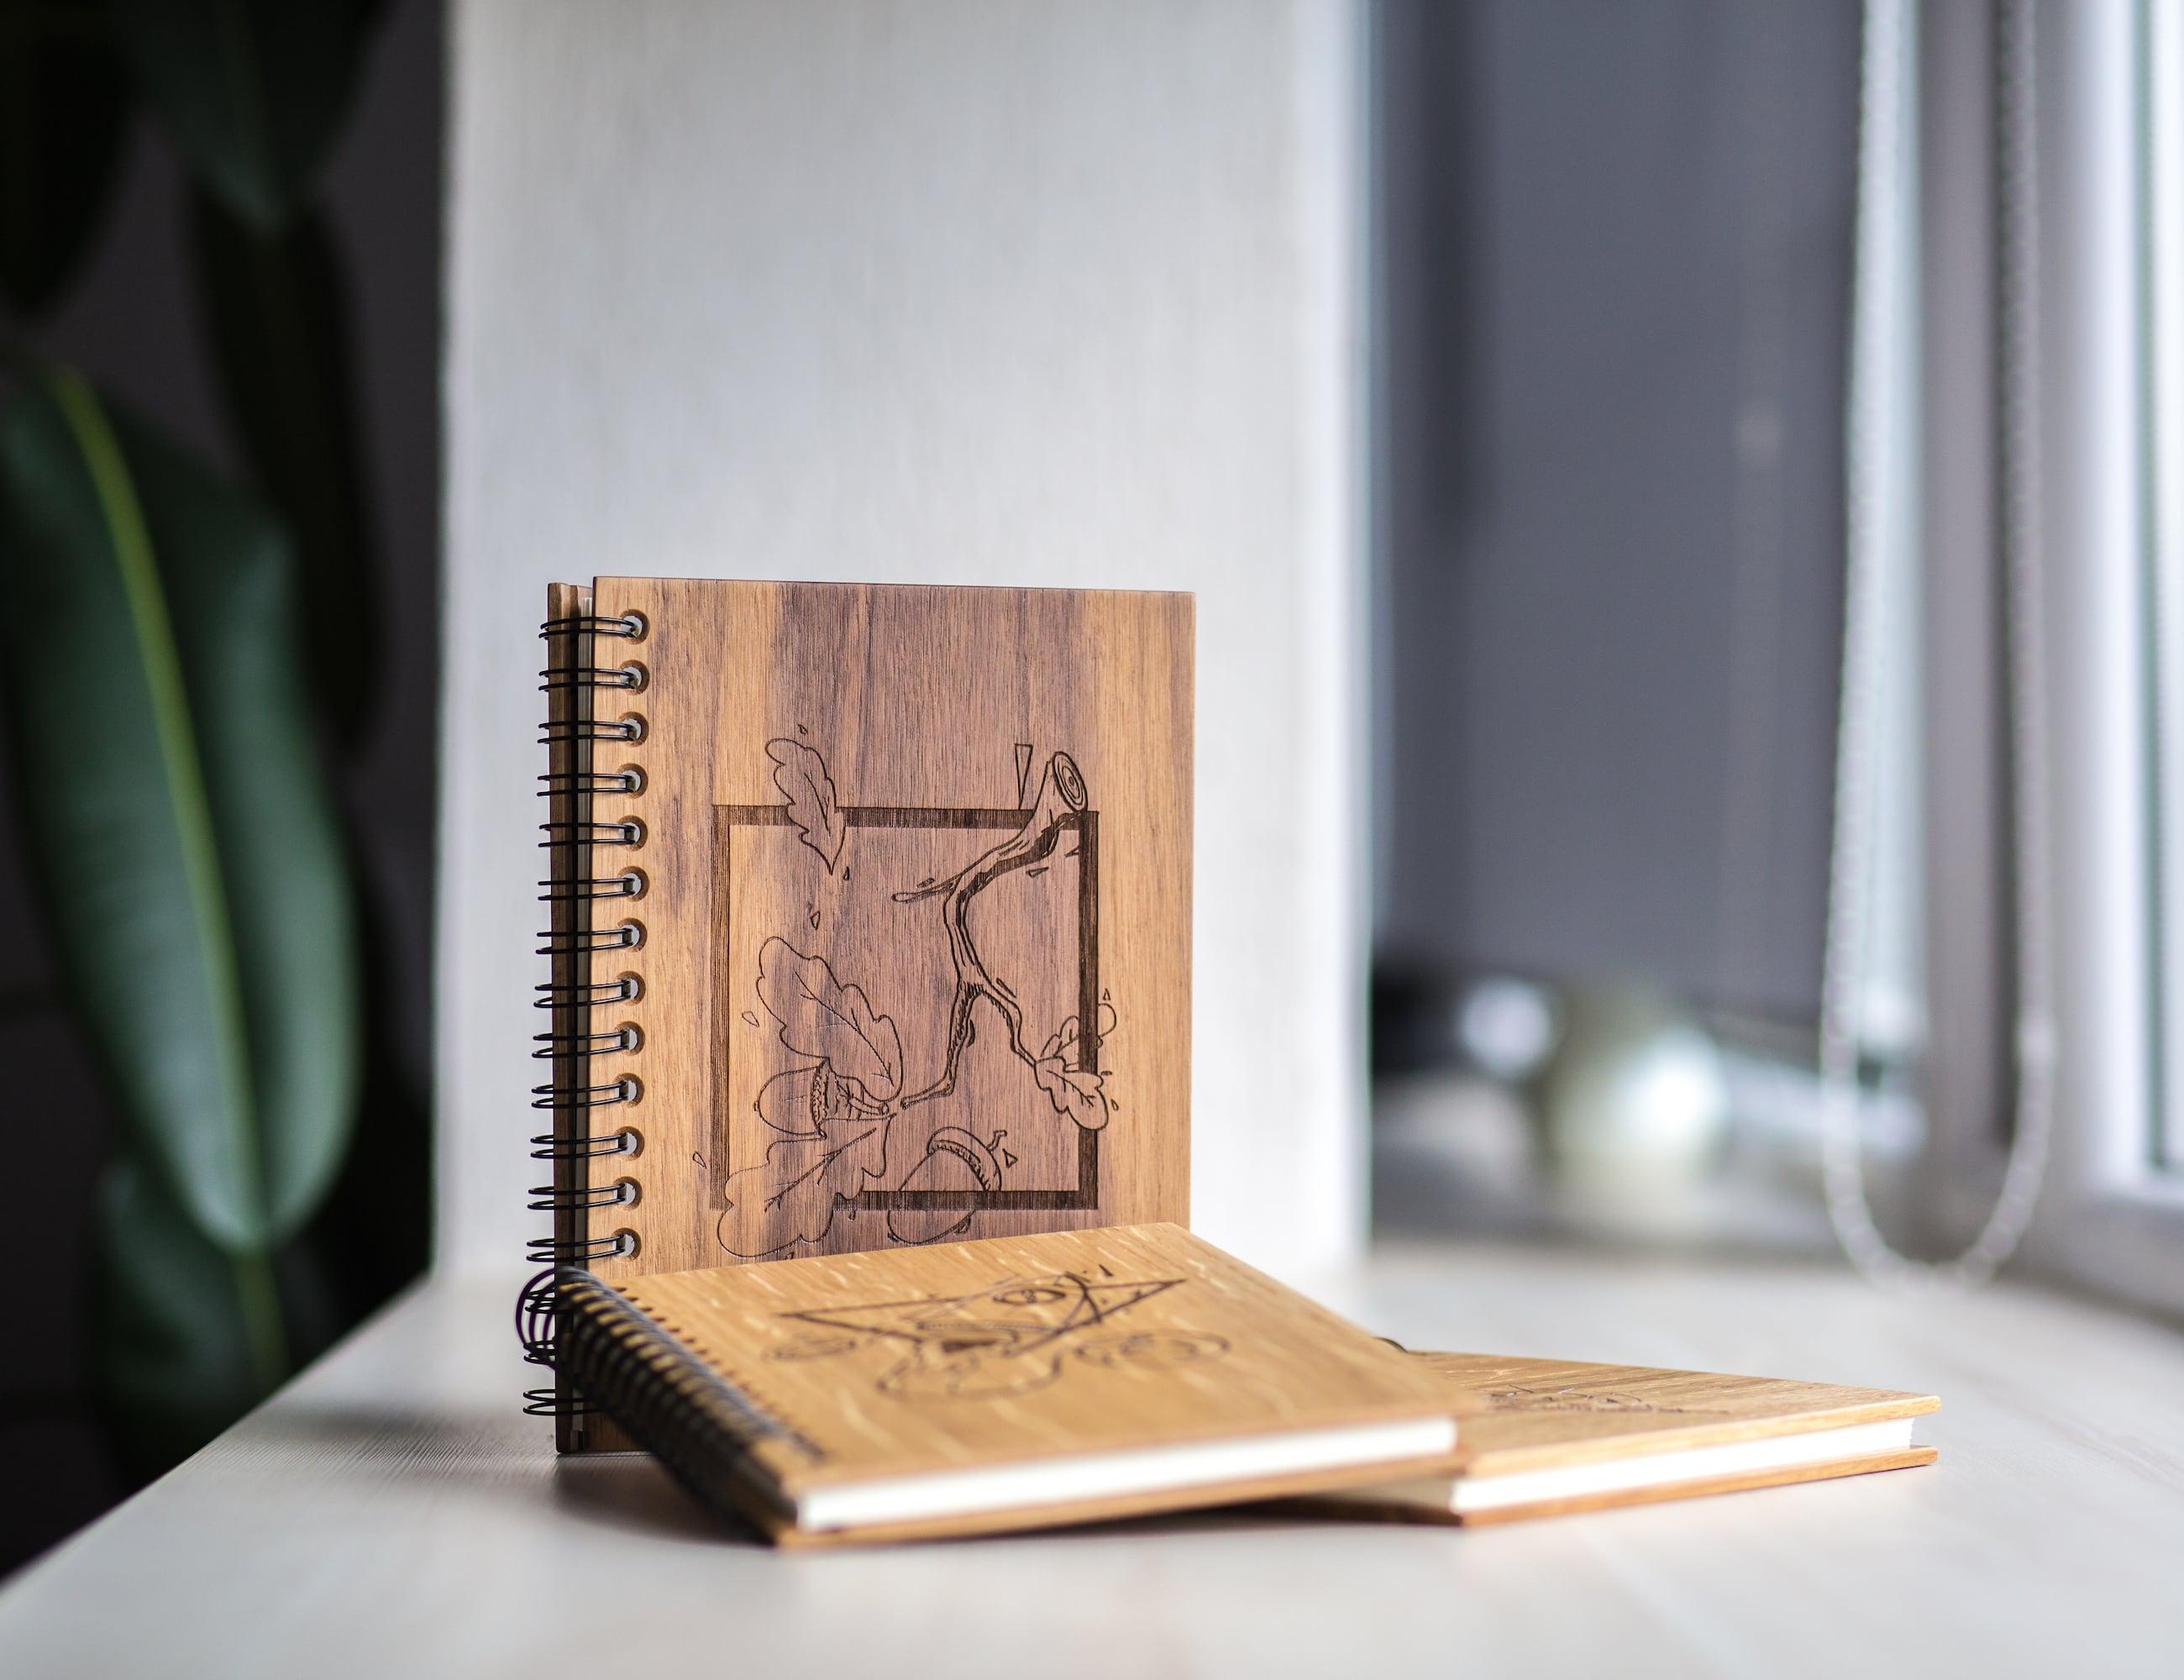 WOOK notes Smart Wooden Notebook